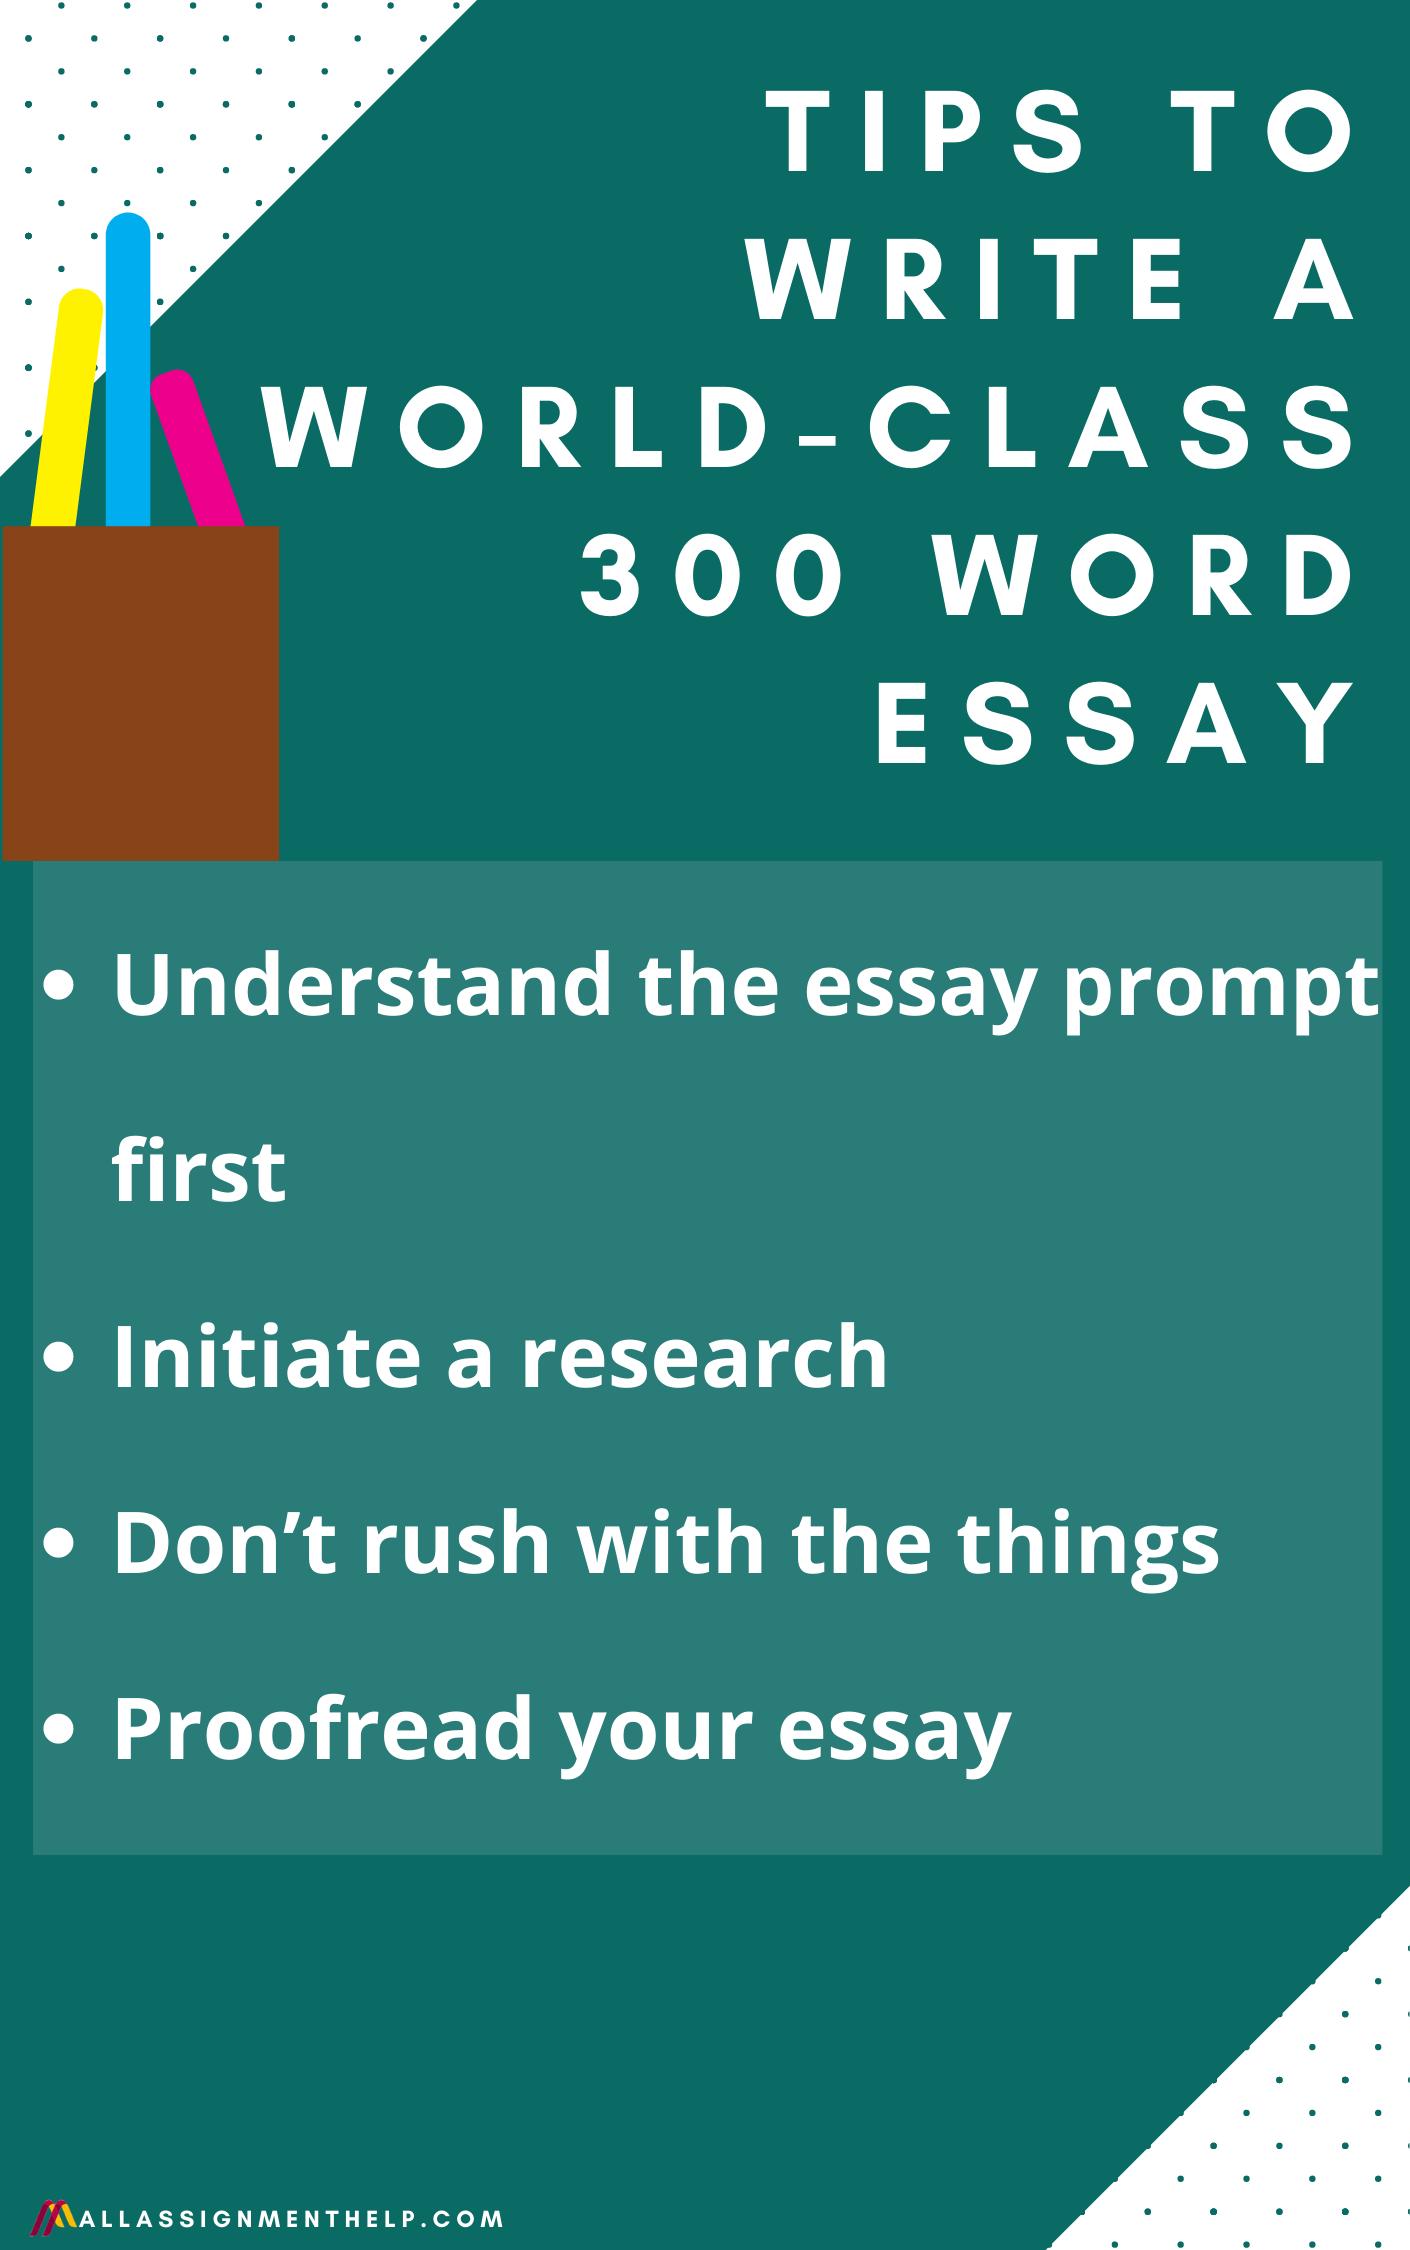 300-word-essay